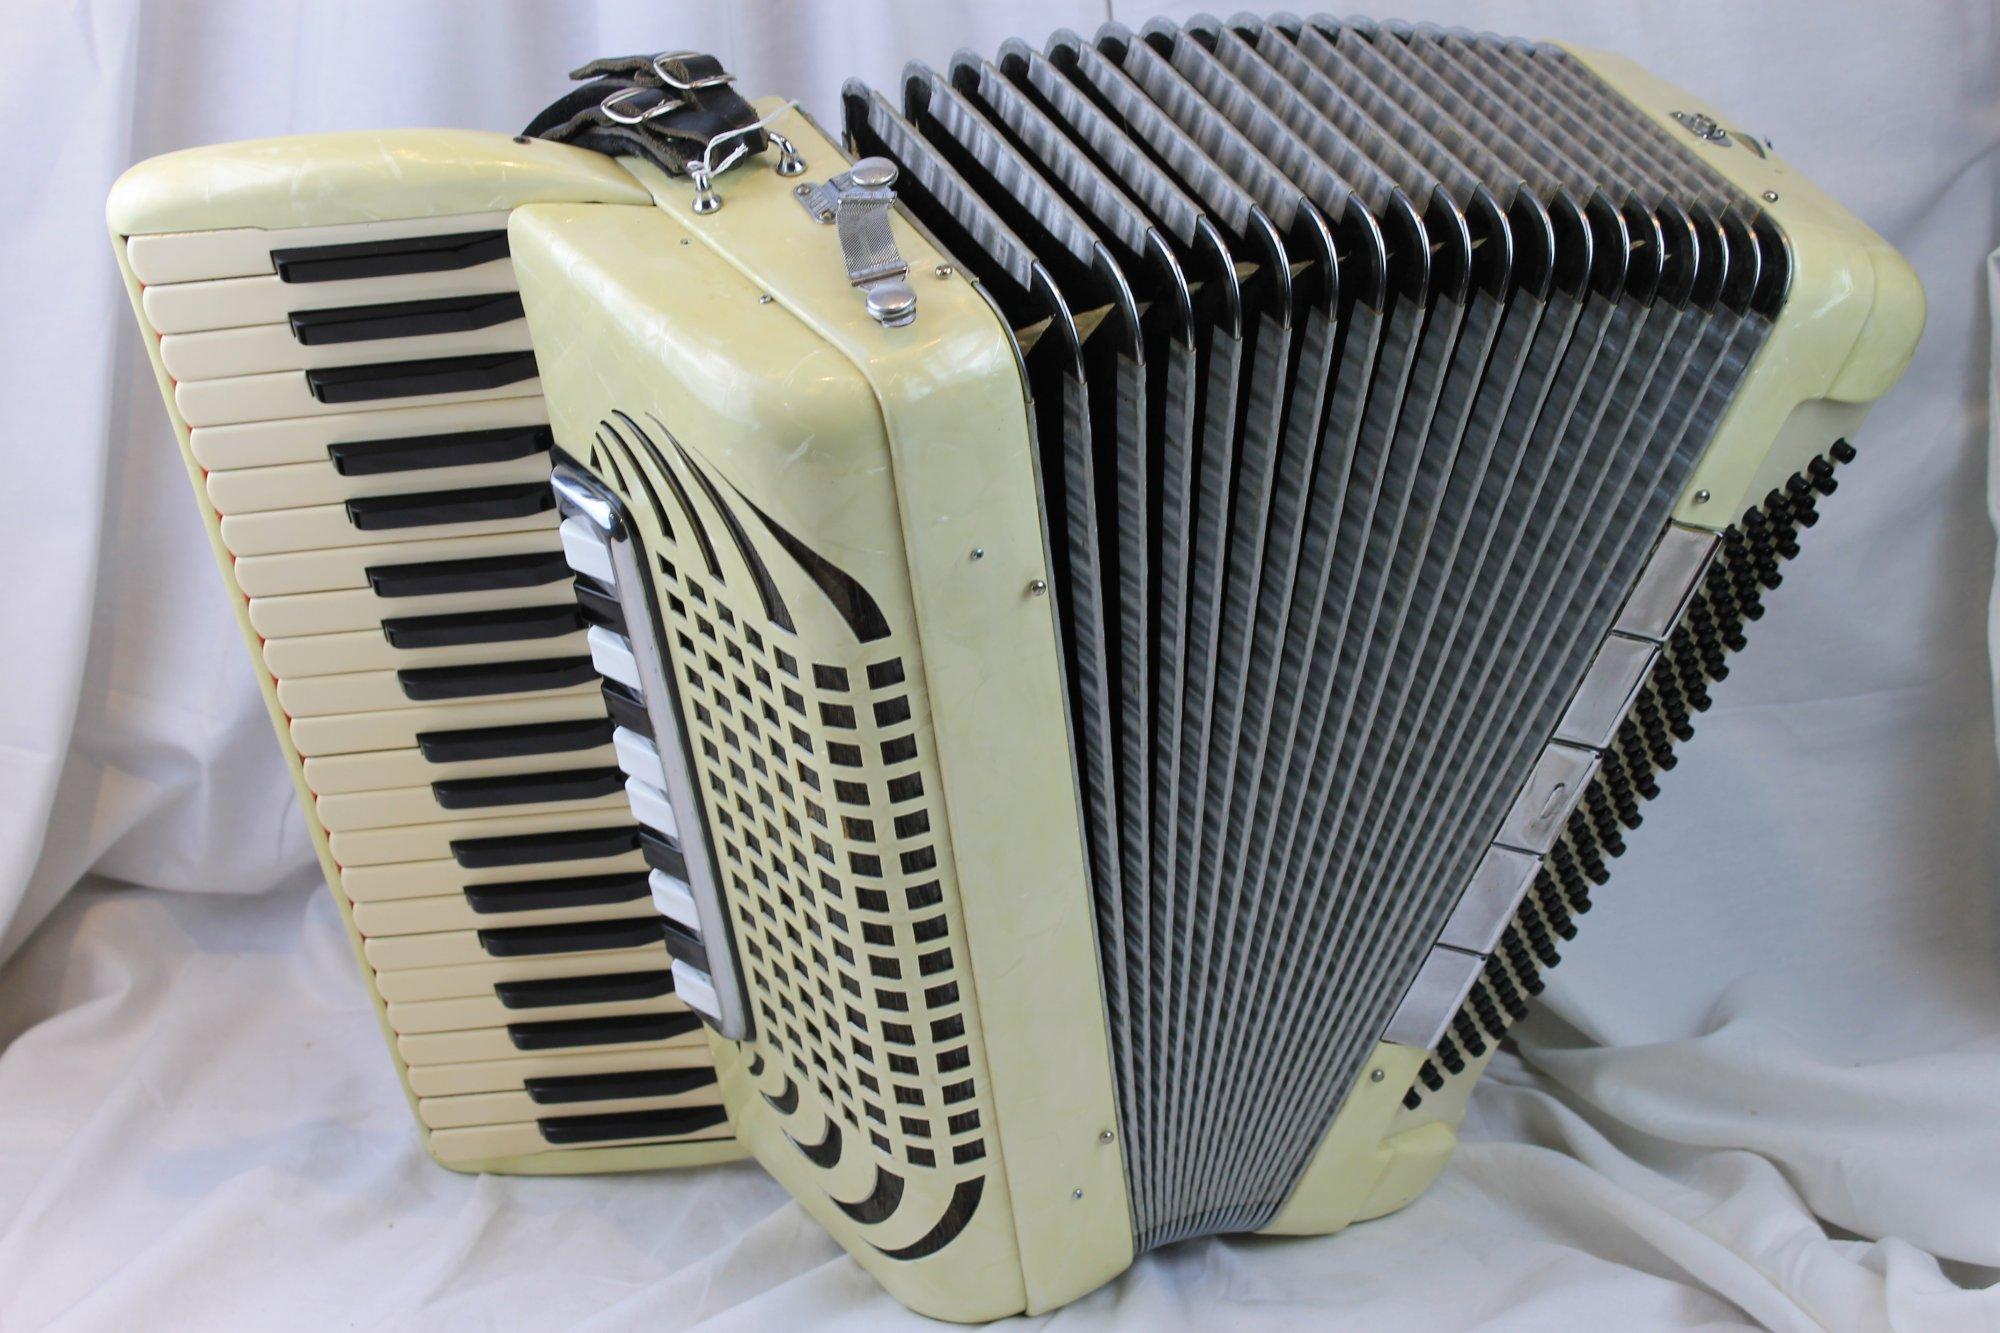 2352 - Cream Pearl Italian Piano Accordion LLMH 41 120